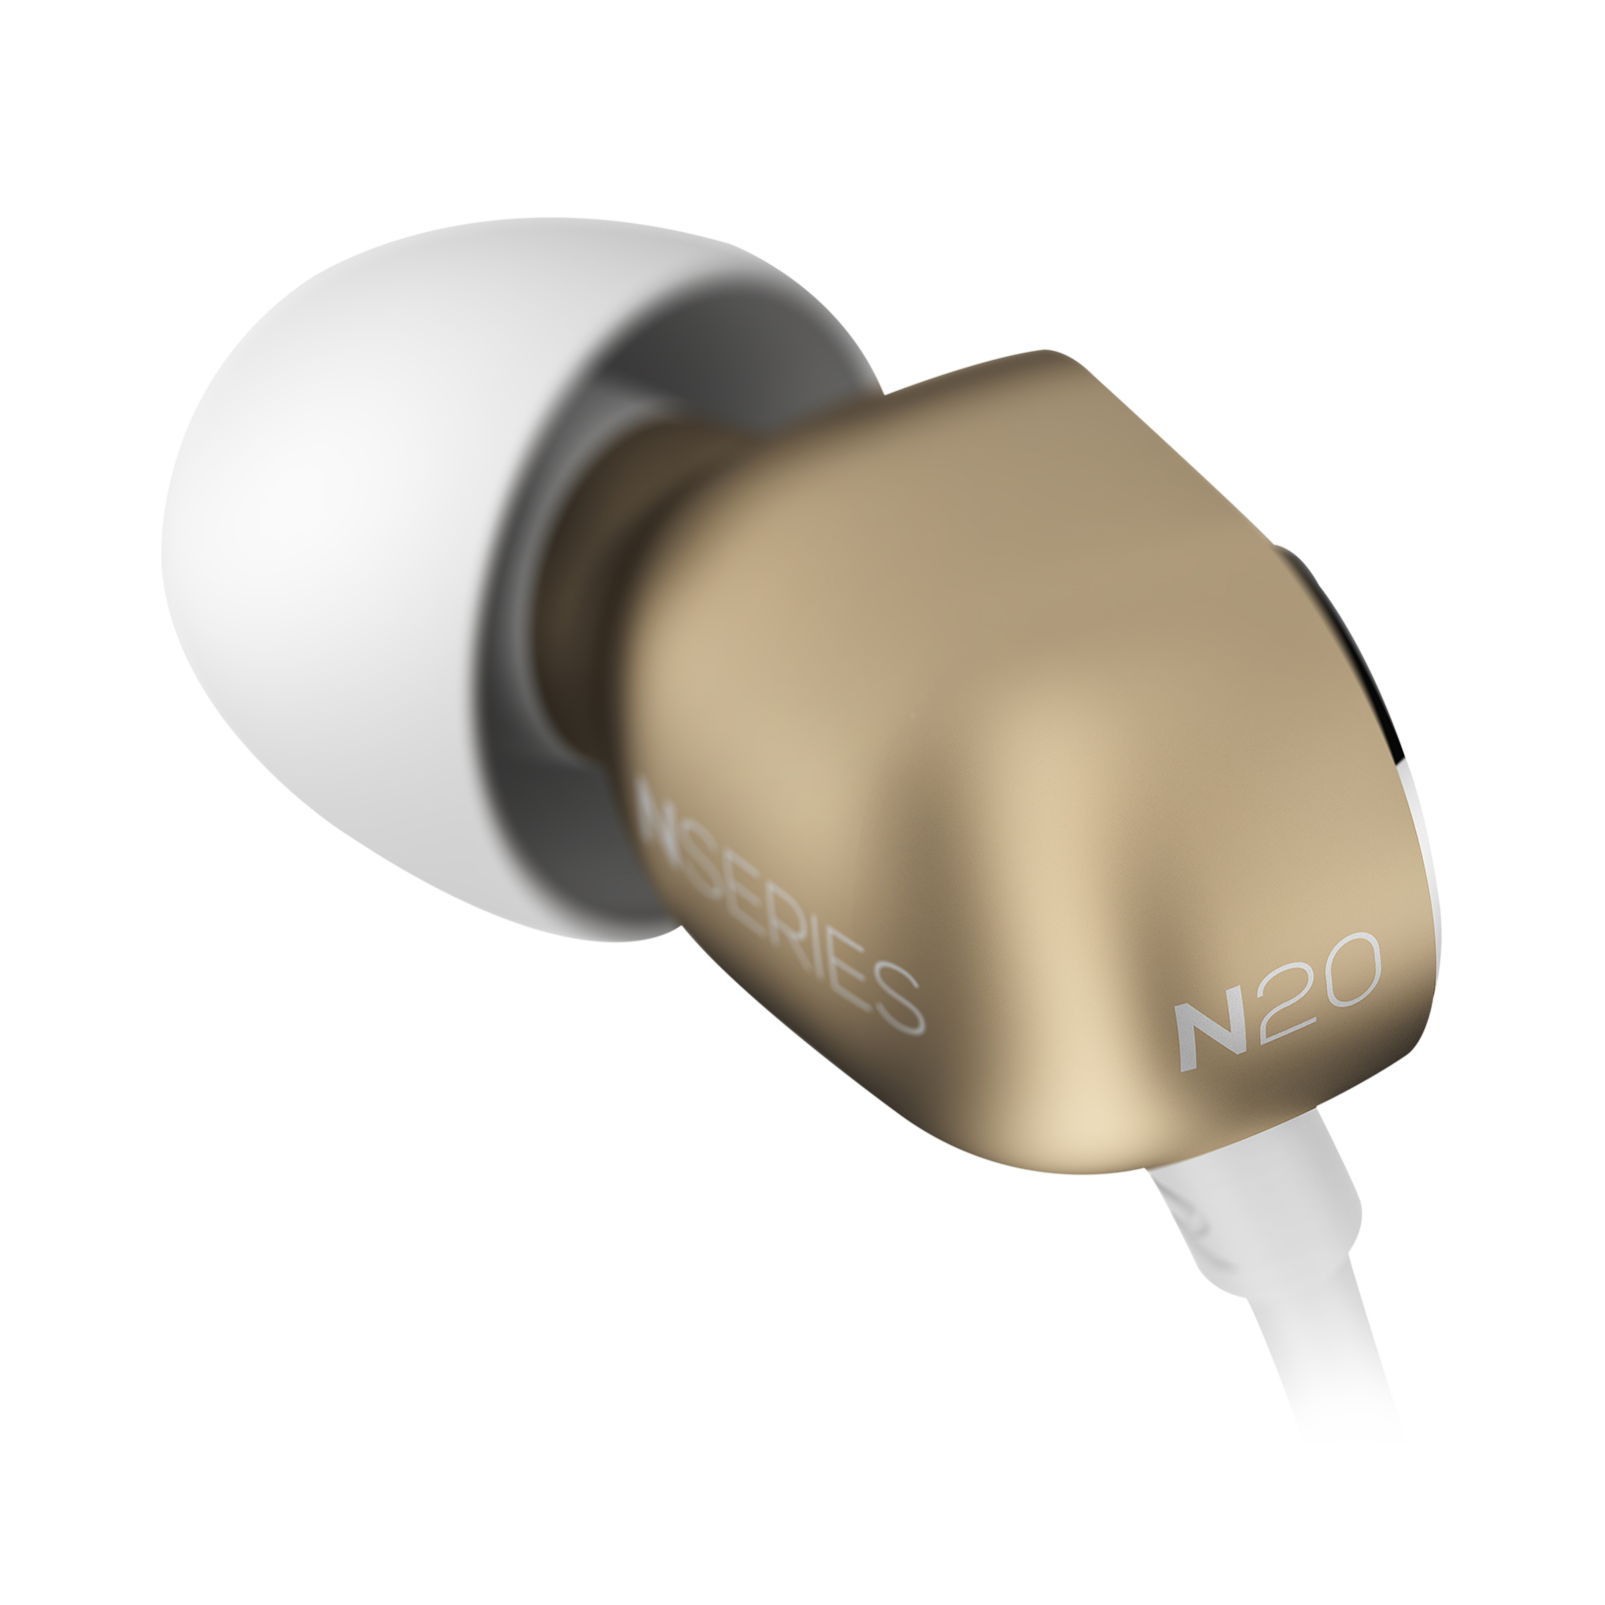 N20 - Gold - Reference class in-ear headphones in aluminum enclousure - Detailshot 3